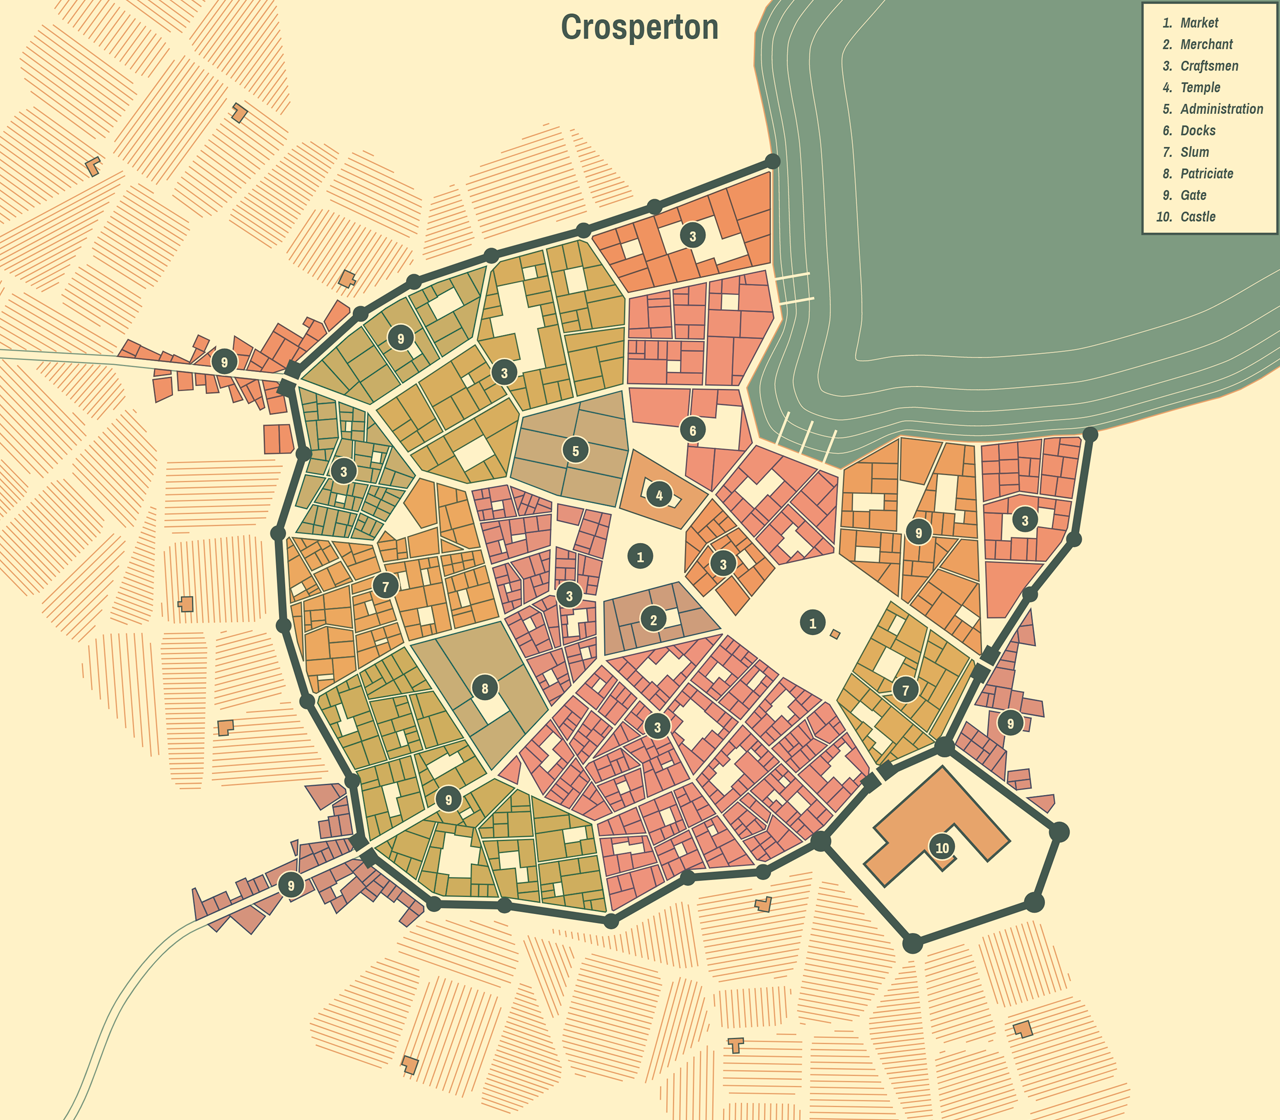 0 5 5: Farm fields, rotation tool and city names - Medieval Fantasy